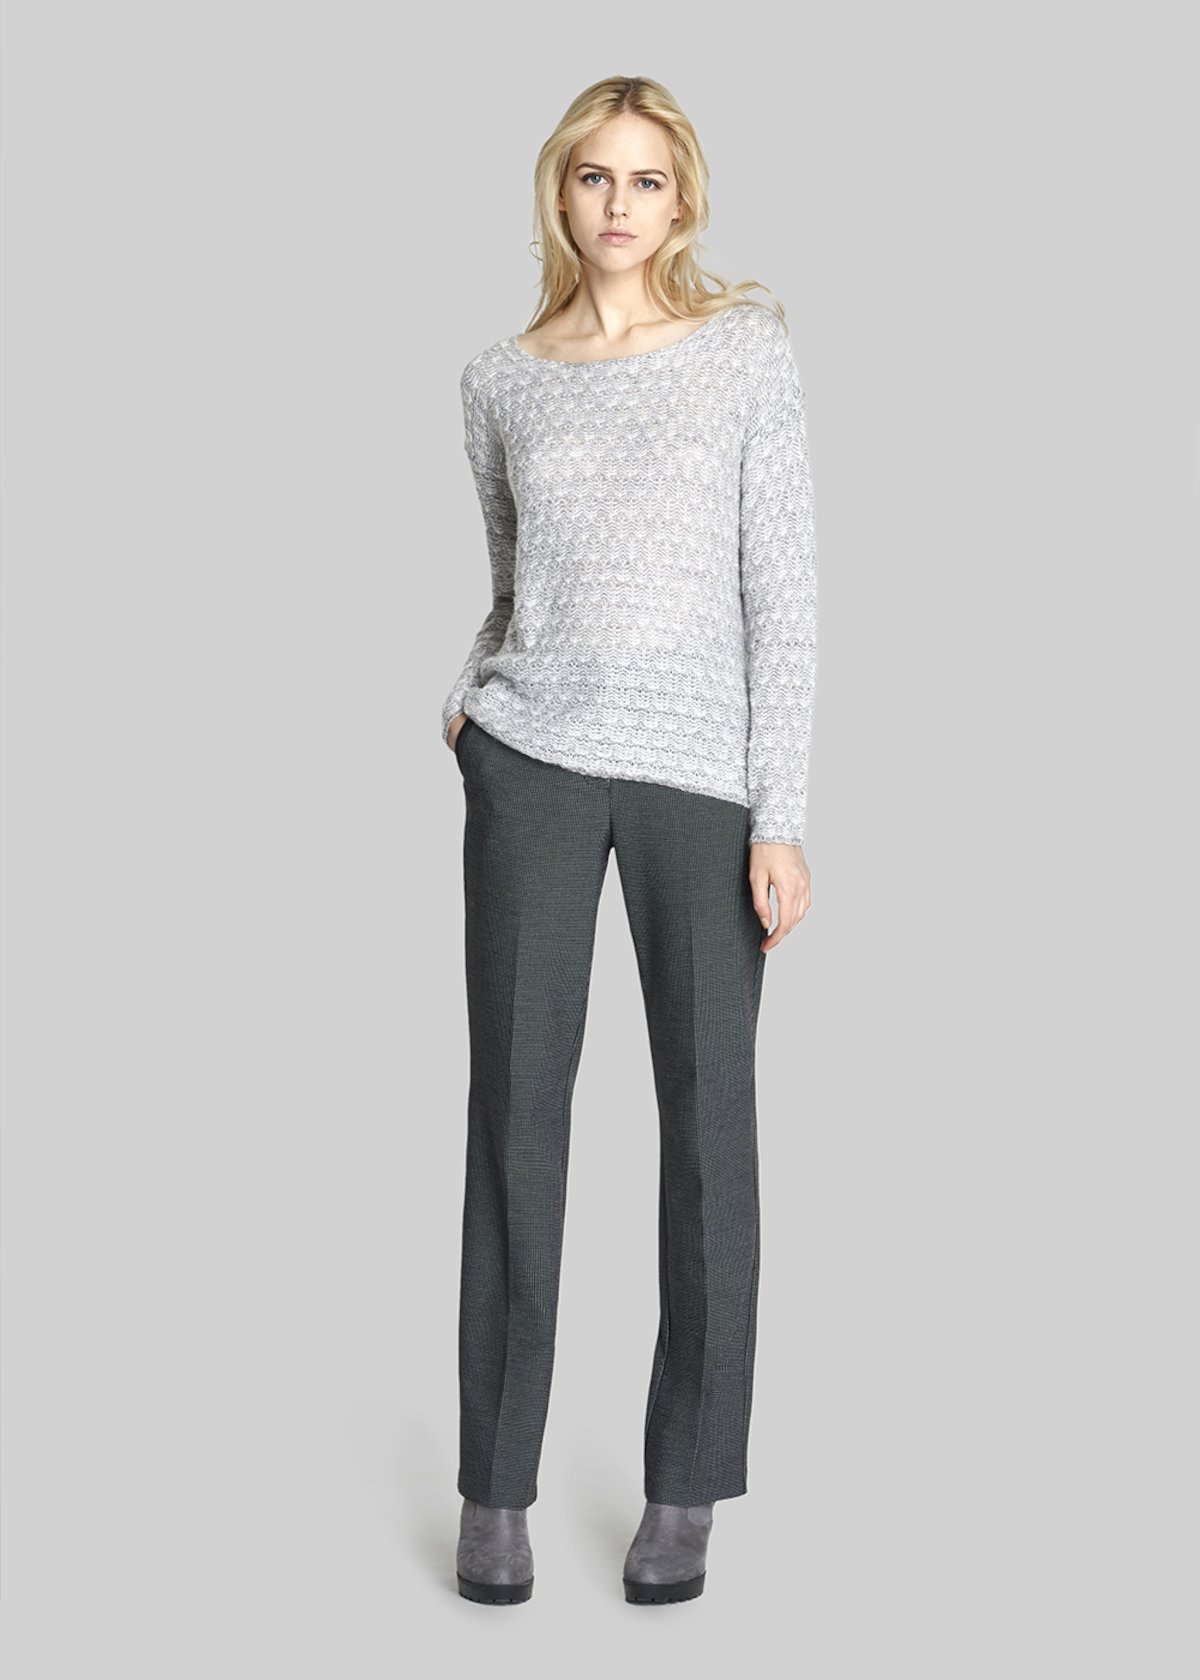 Mirelle Jersey with raglan sleeves - Medium Grey Melange